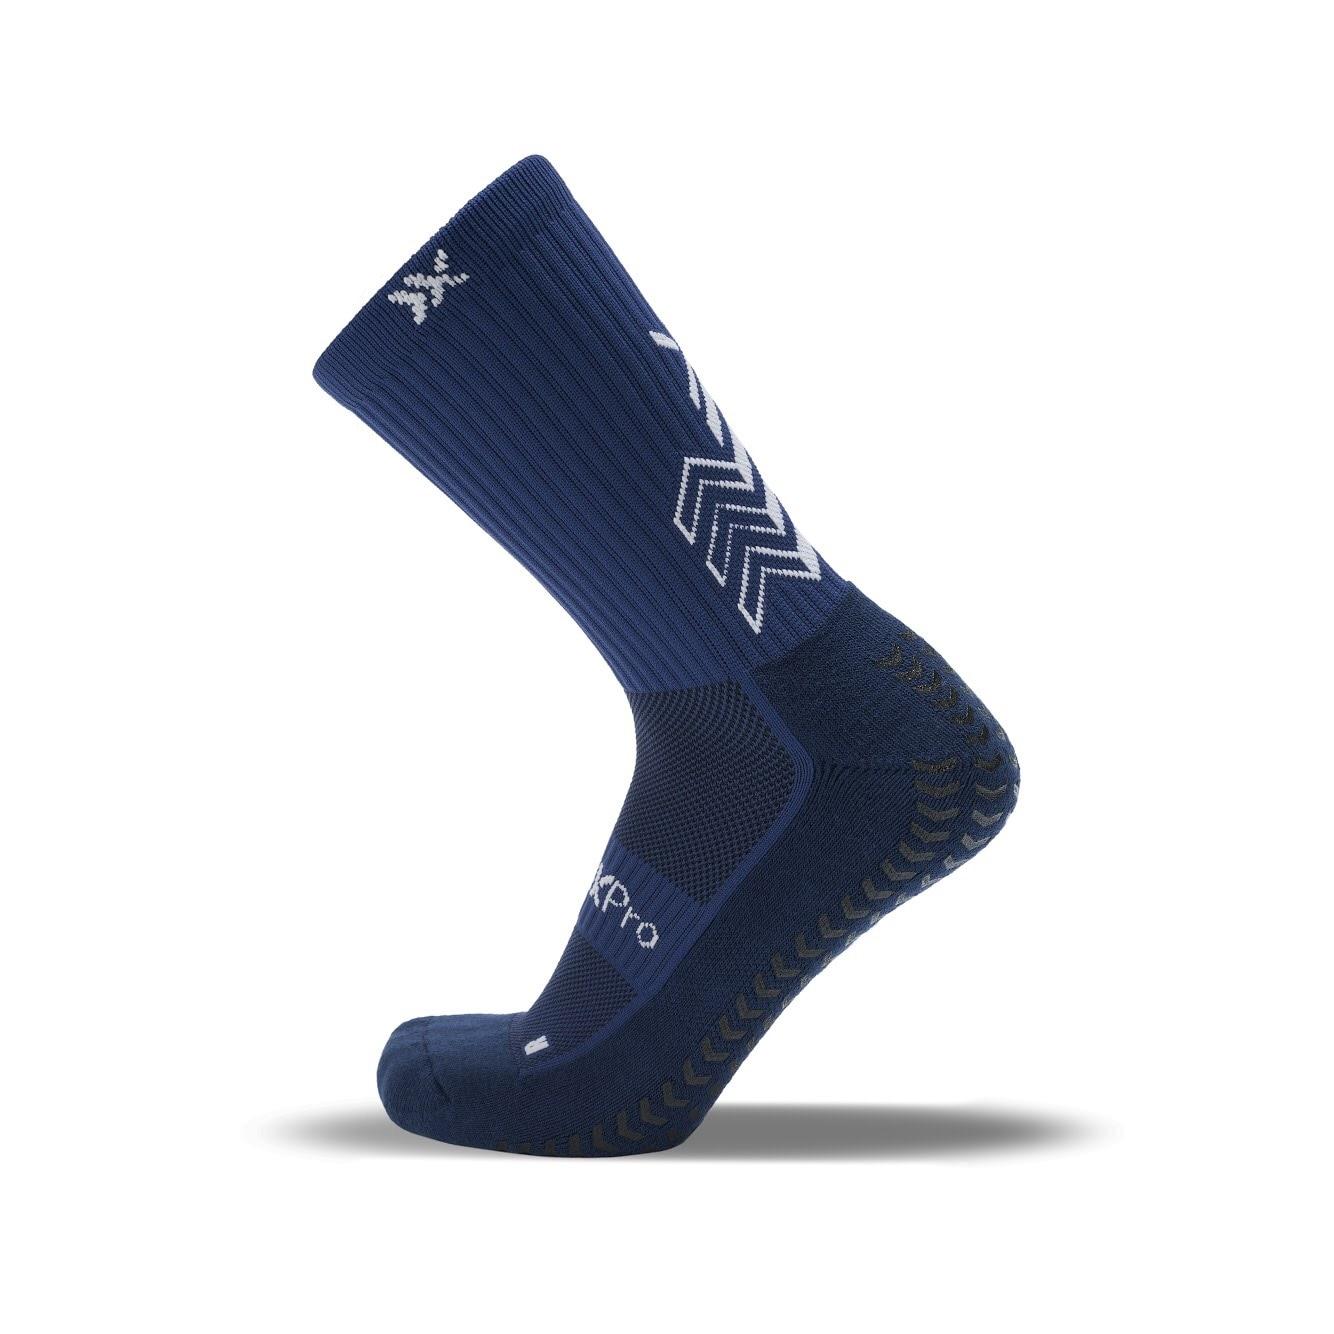 SOXPro Grip Fotballstrømper Mørkeblå